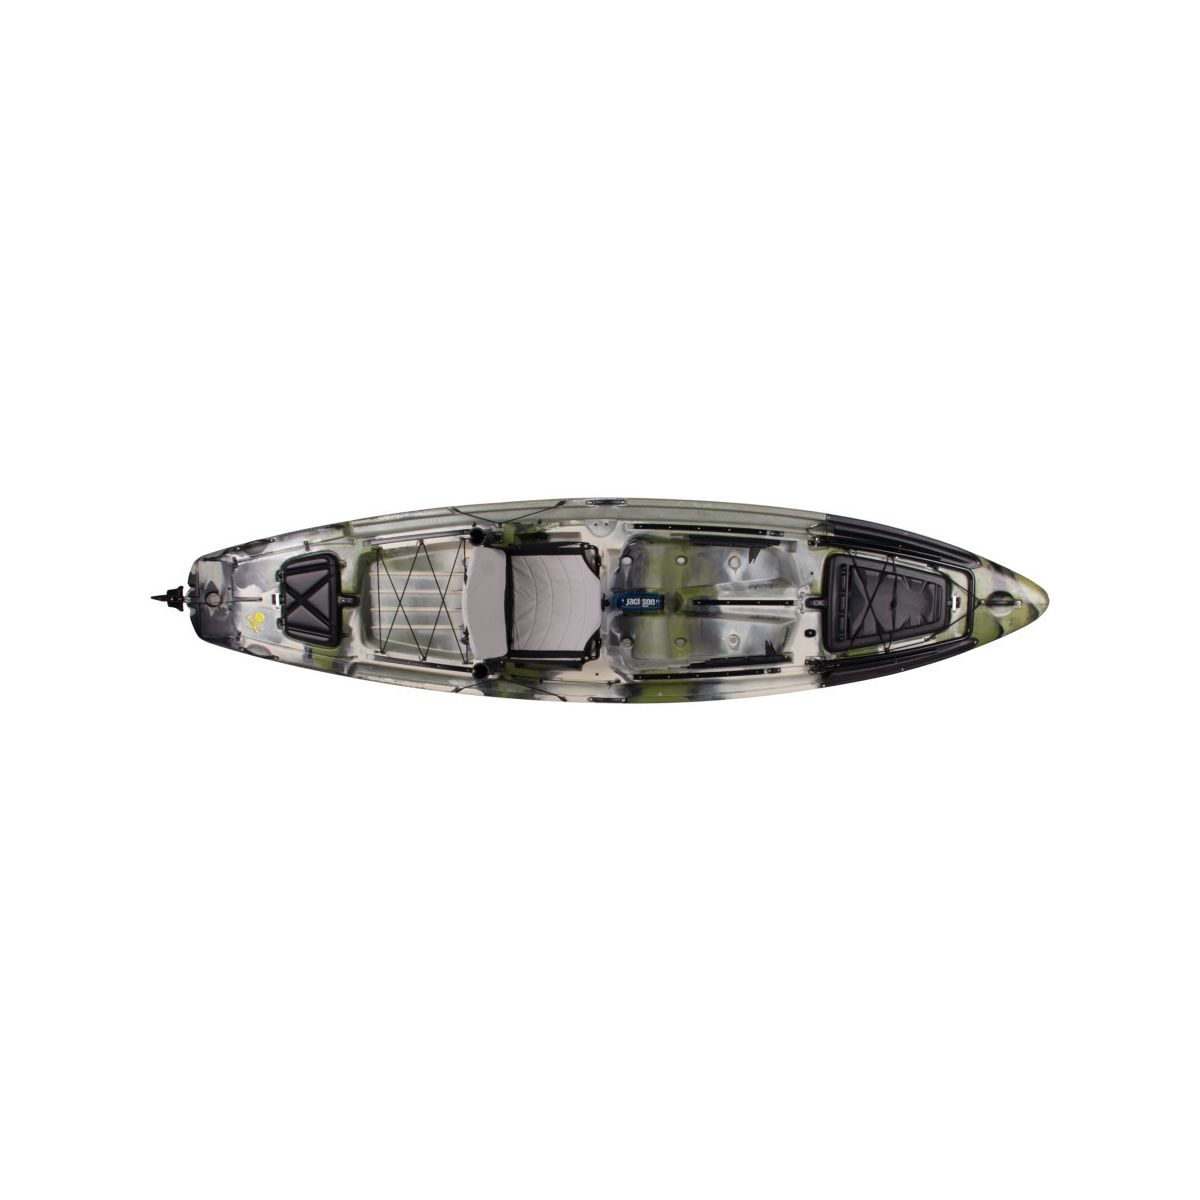 Jackson Kayaks Big Rig Kayak